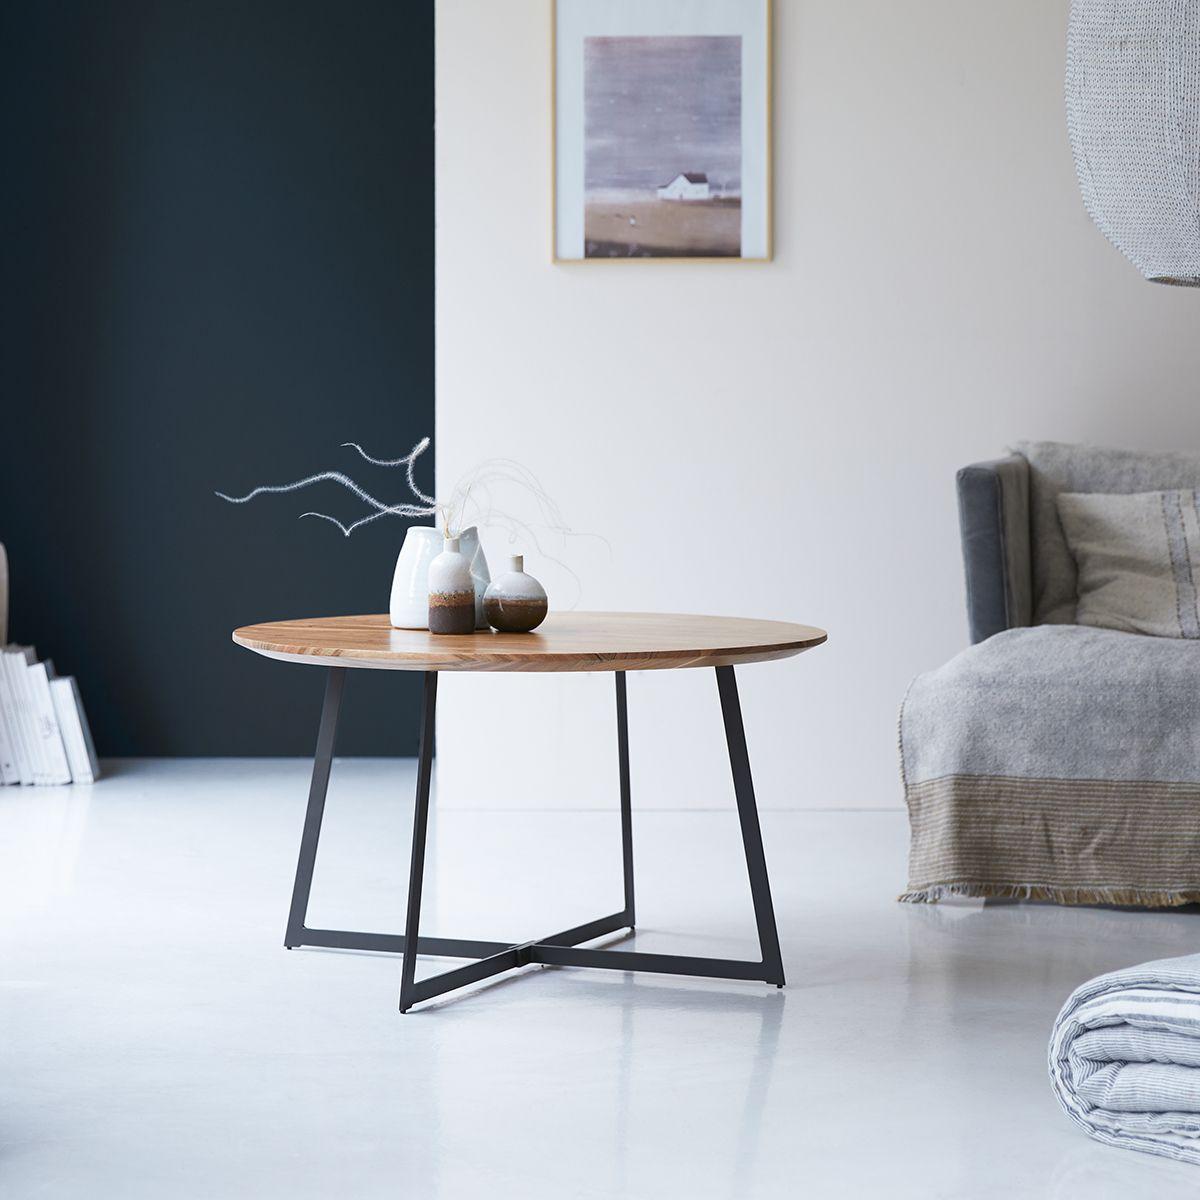 Tikamoon Temis Solid Acacia Coffee Table In 2021 Coffee Table Living Room Coffee Table Coffee Table Wood [ 1200 x 1200 Pixel ]